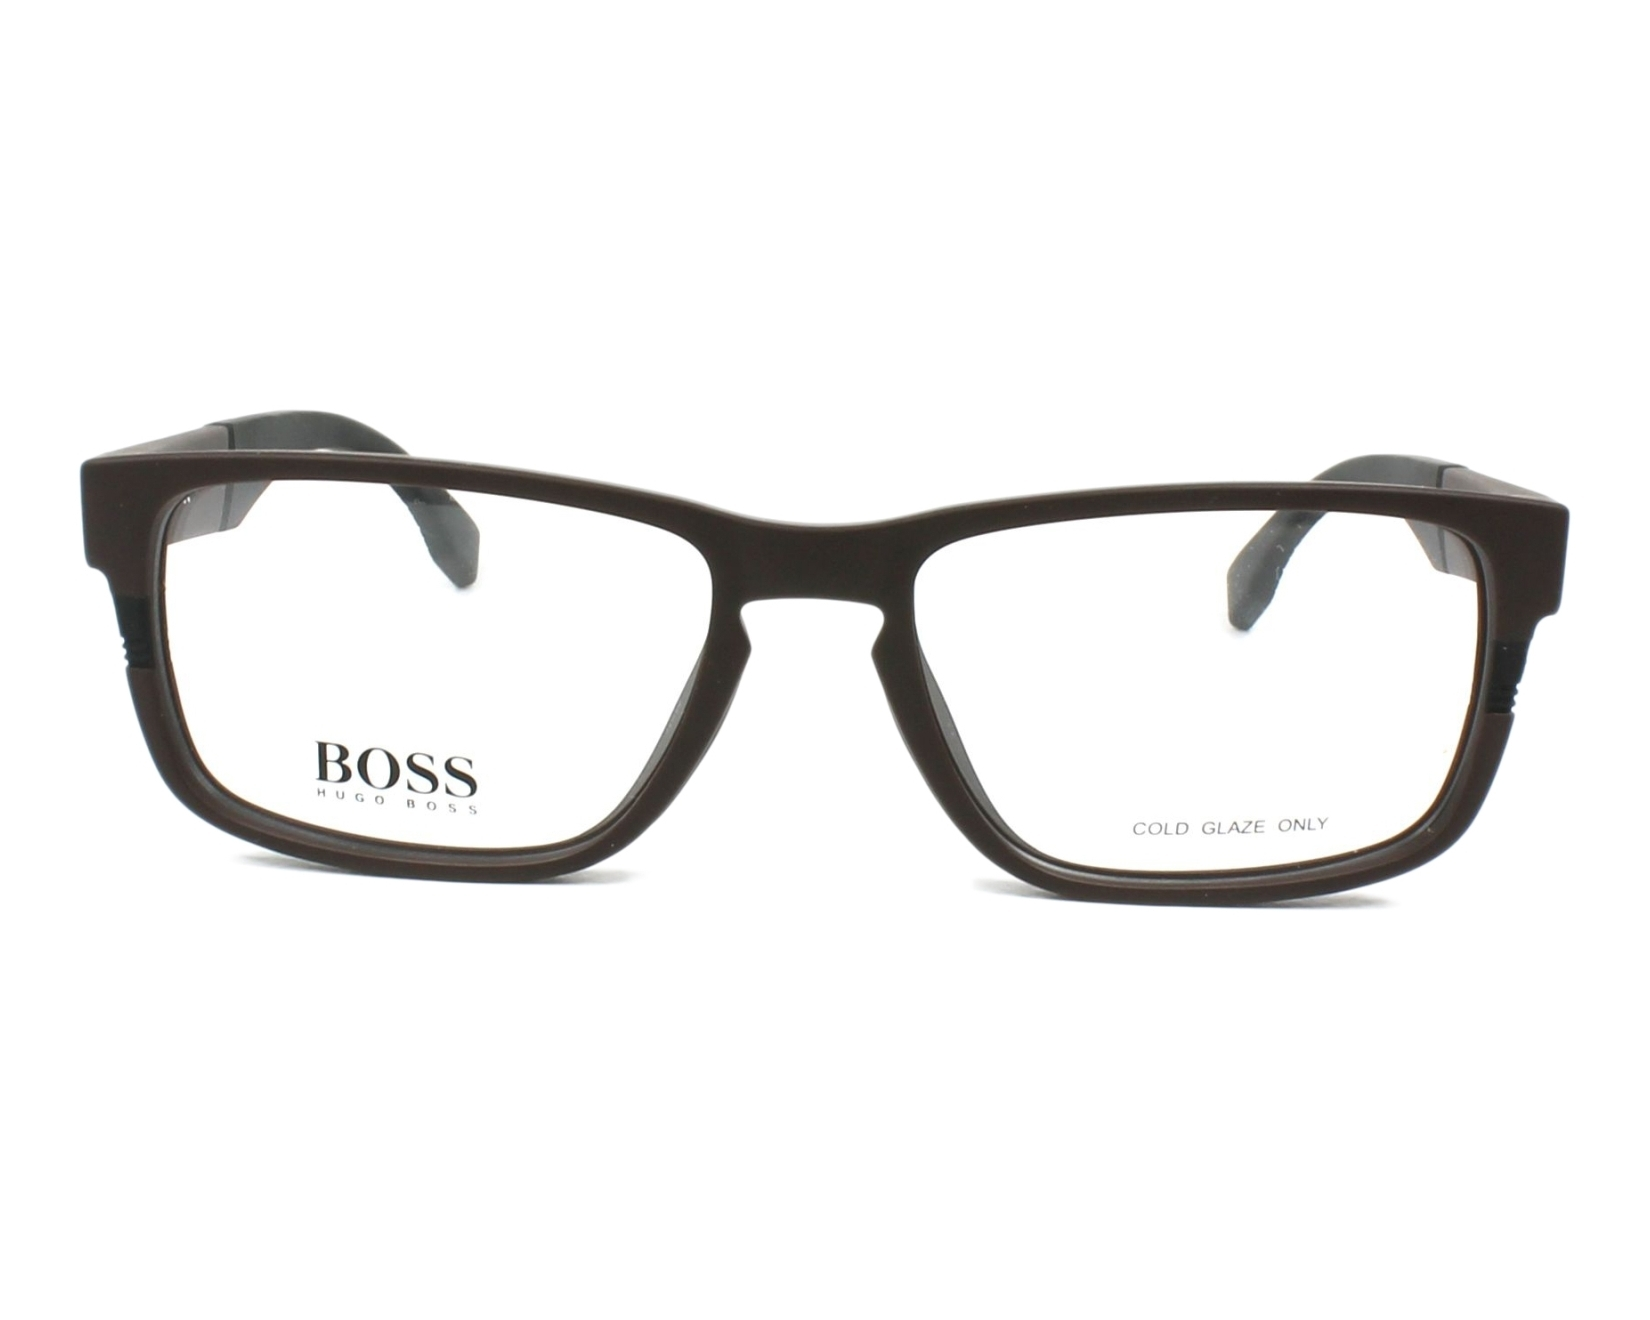 Hugo Boss Brillen BOSS 0917 1XF 31zAJEgvGL - sfstreetmusic.com